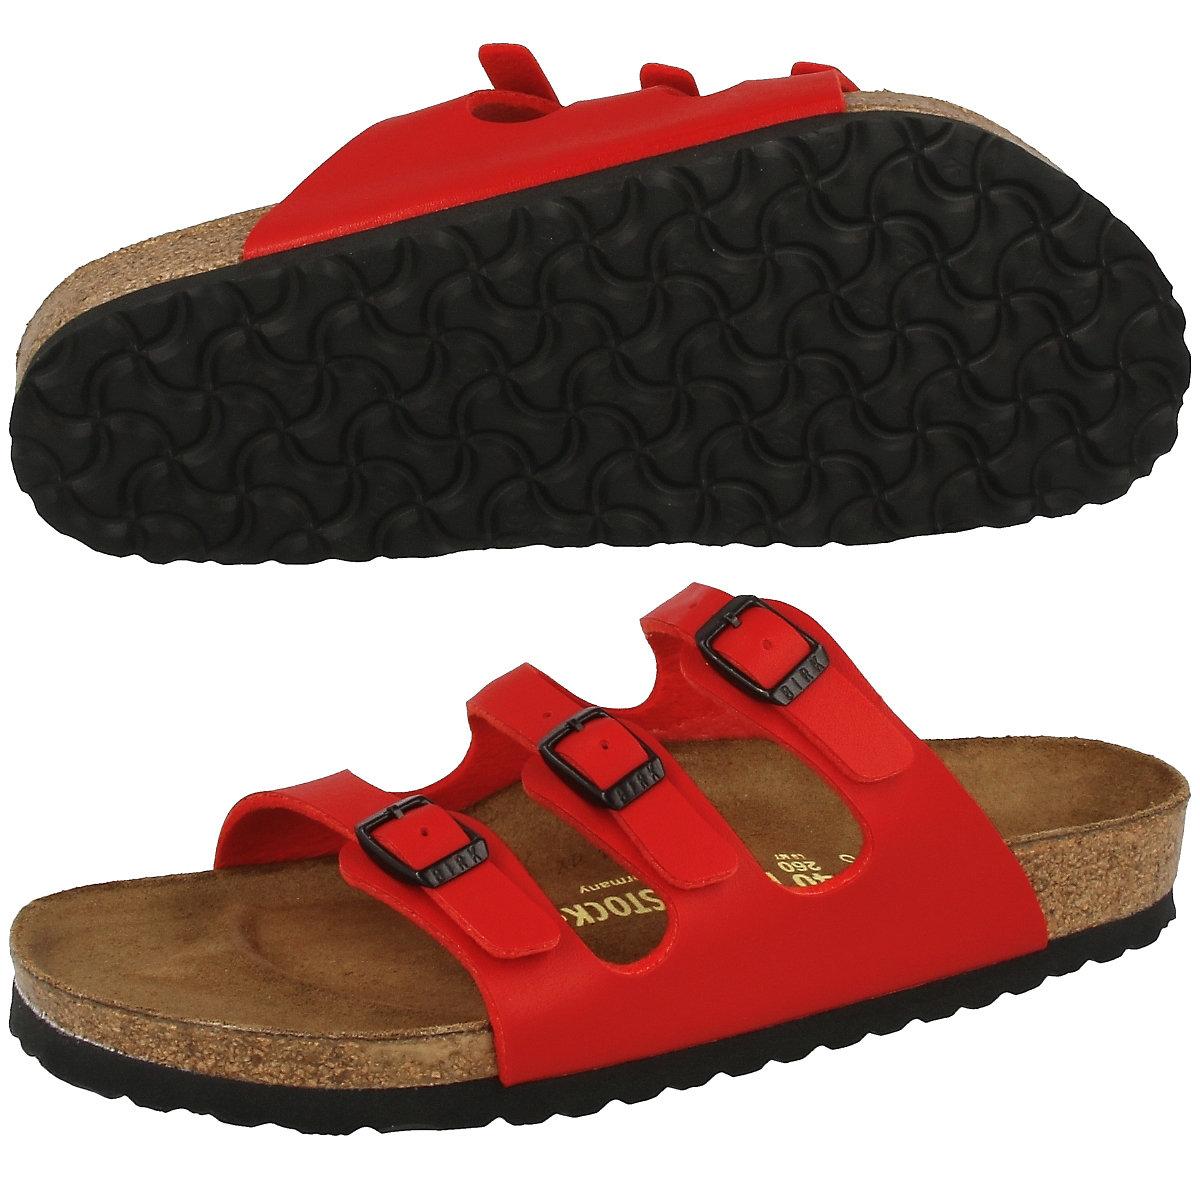 Nike Schuhe Strass